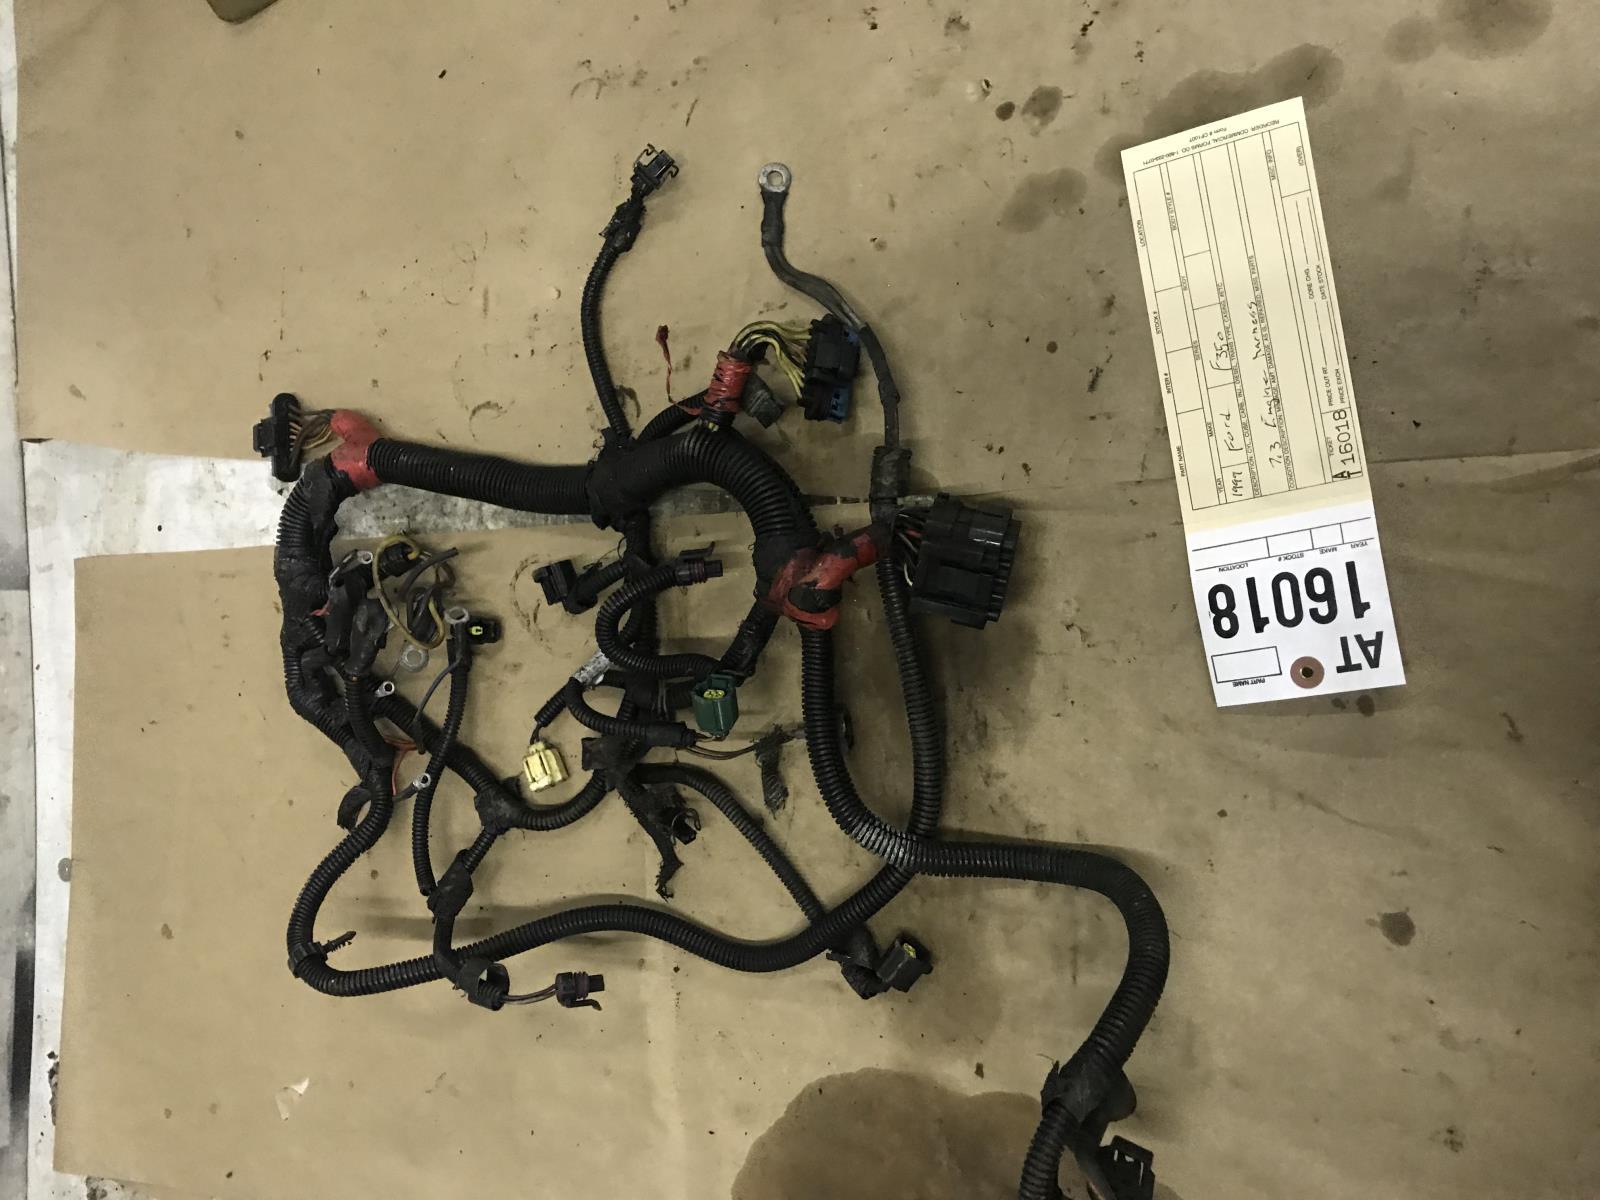 1999 Ford F350 F450 7.3L powerstroke engine wiring harness at16018   eBay   99 Ford Wiring Harness      eBay